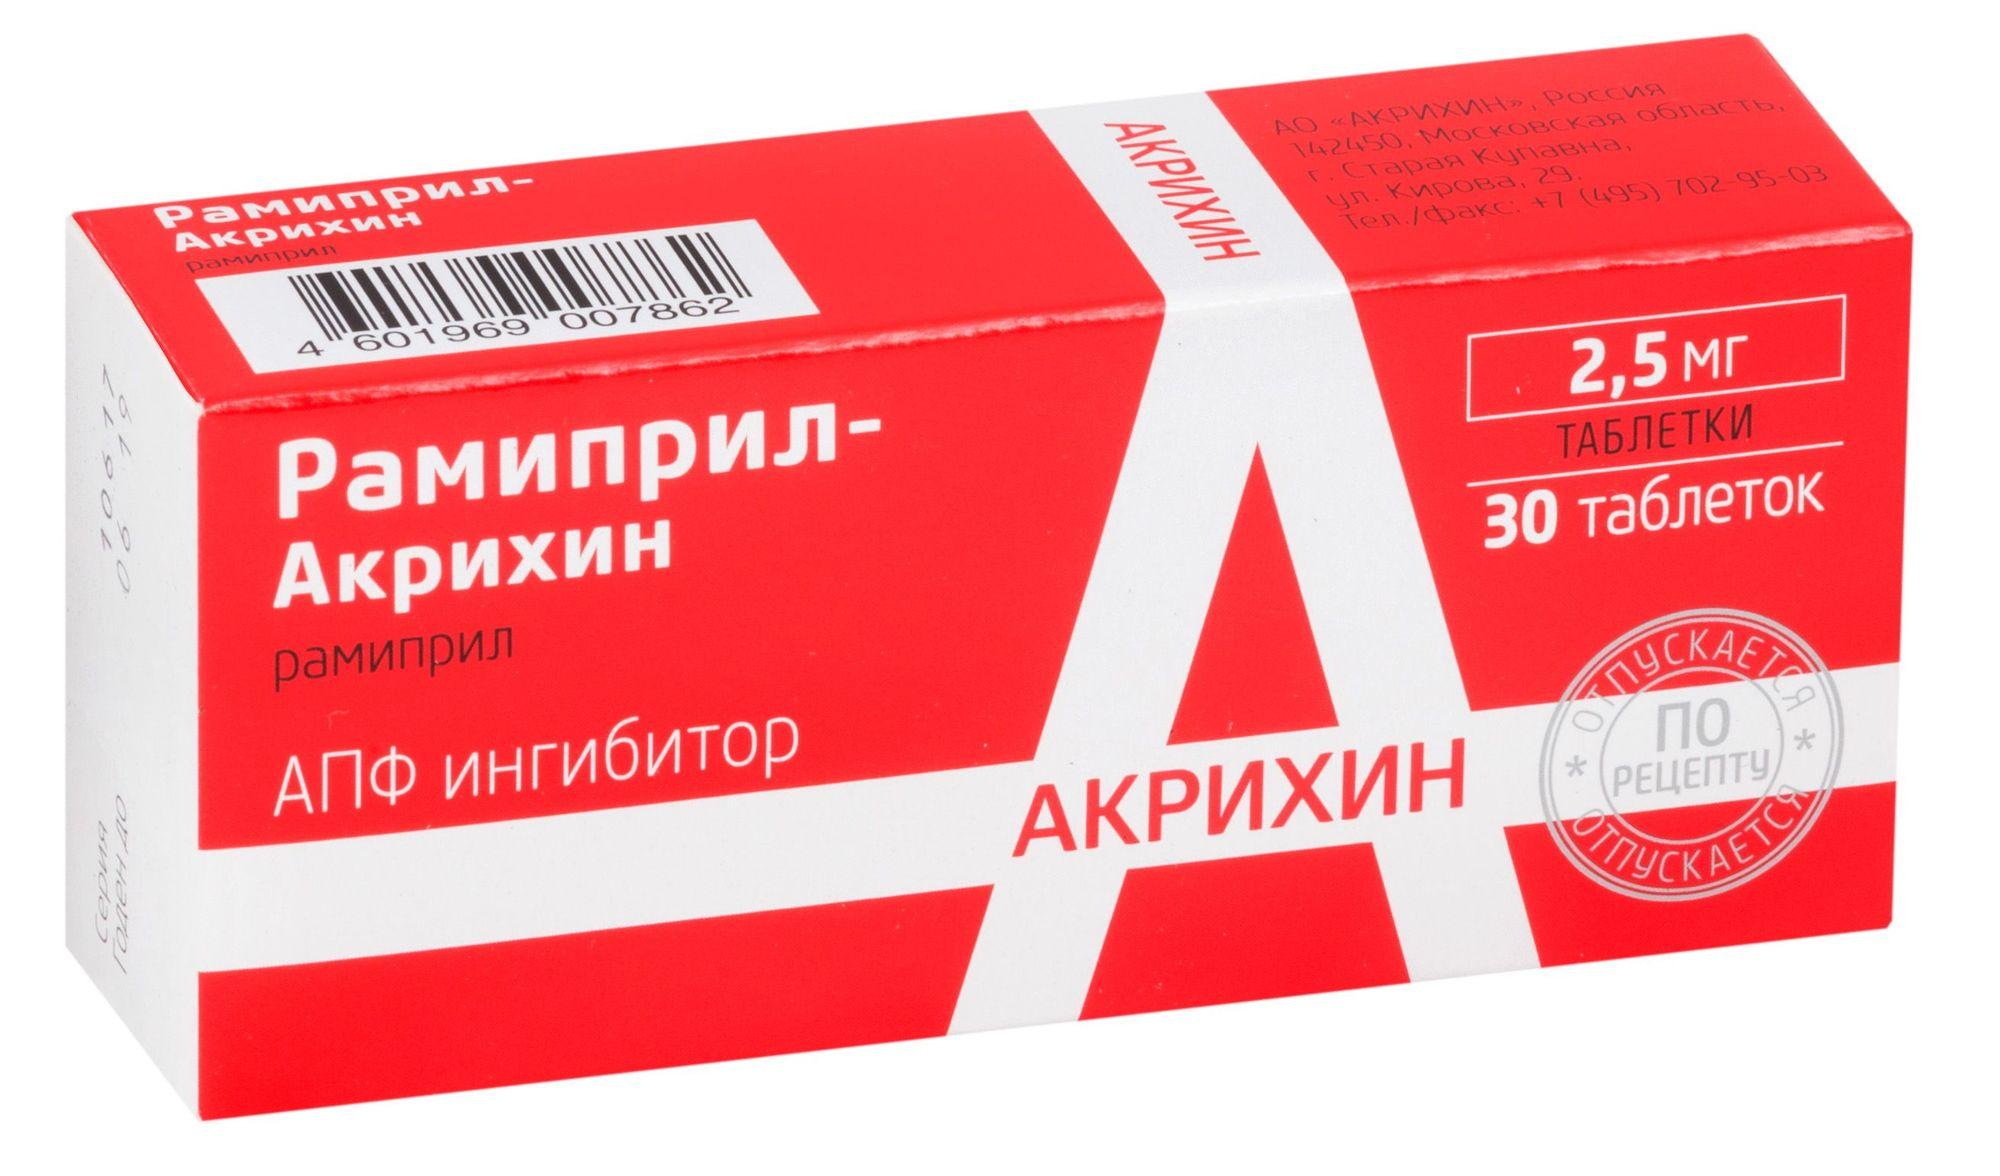 фото упаковки Рамиприл